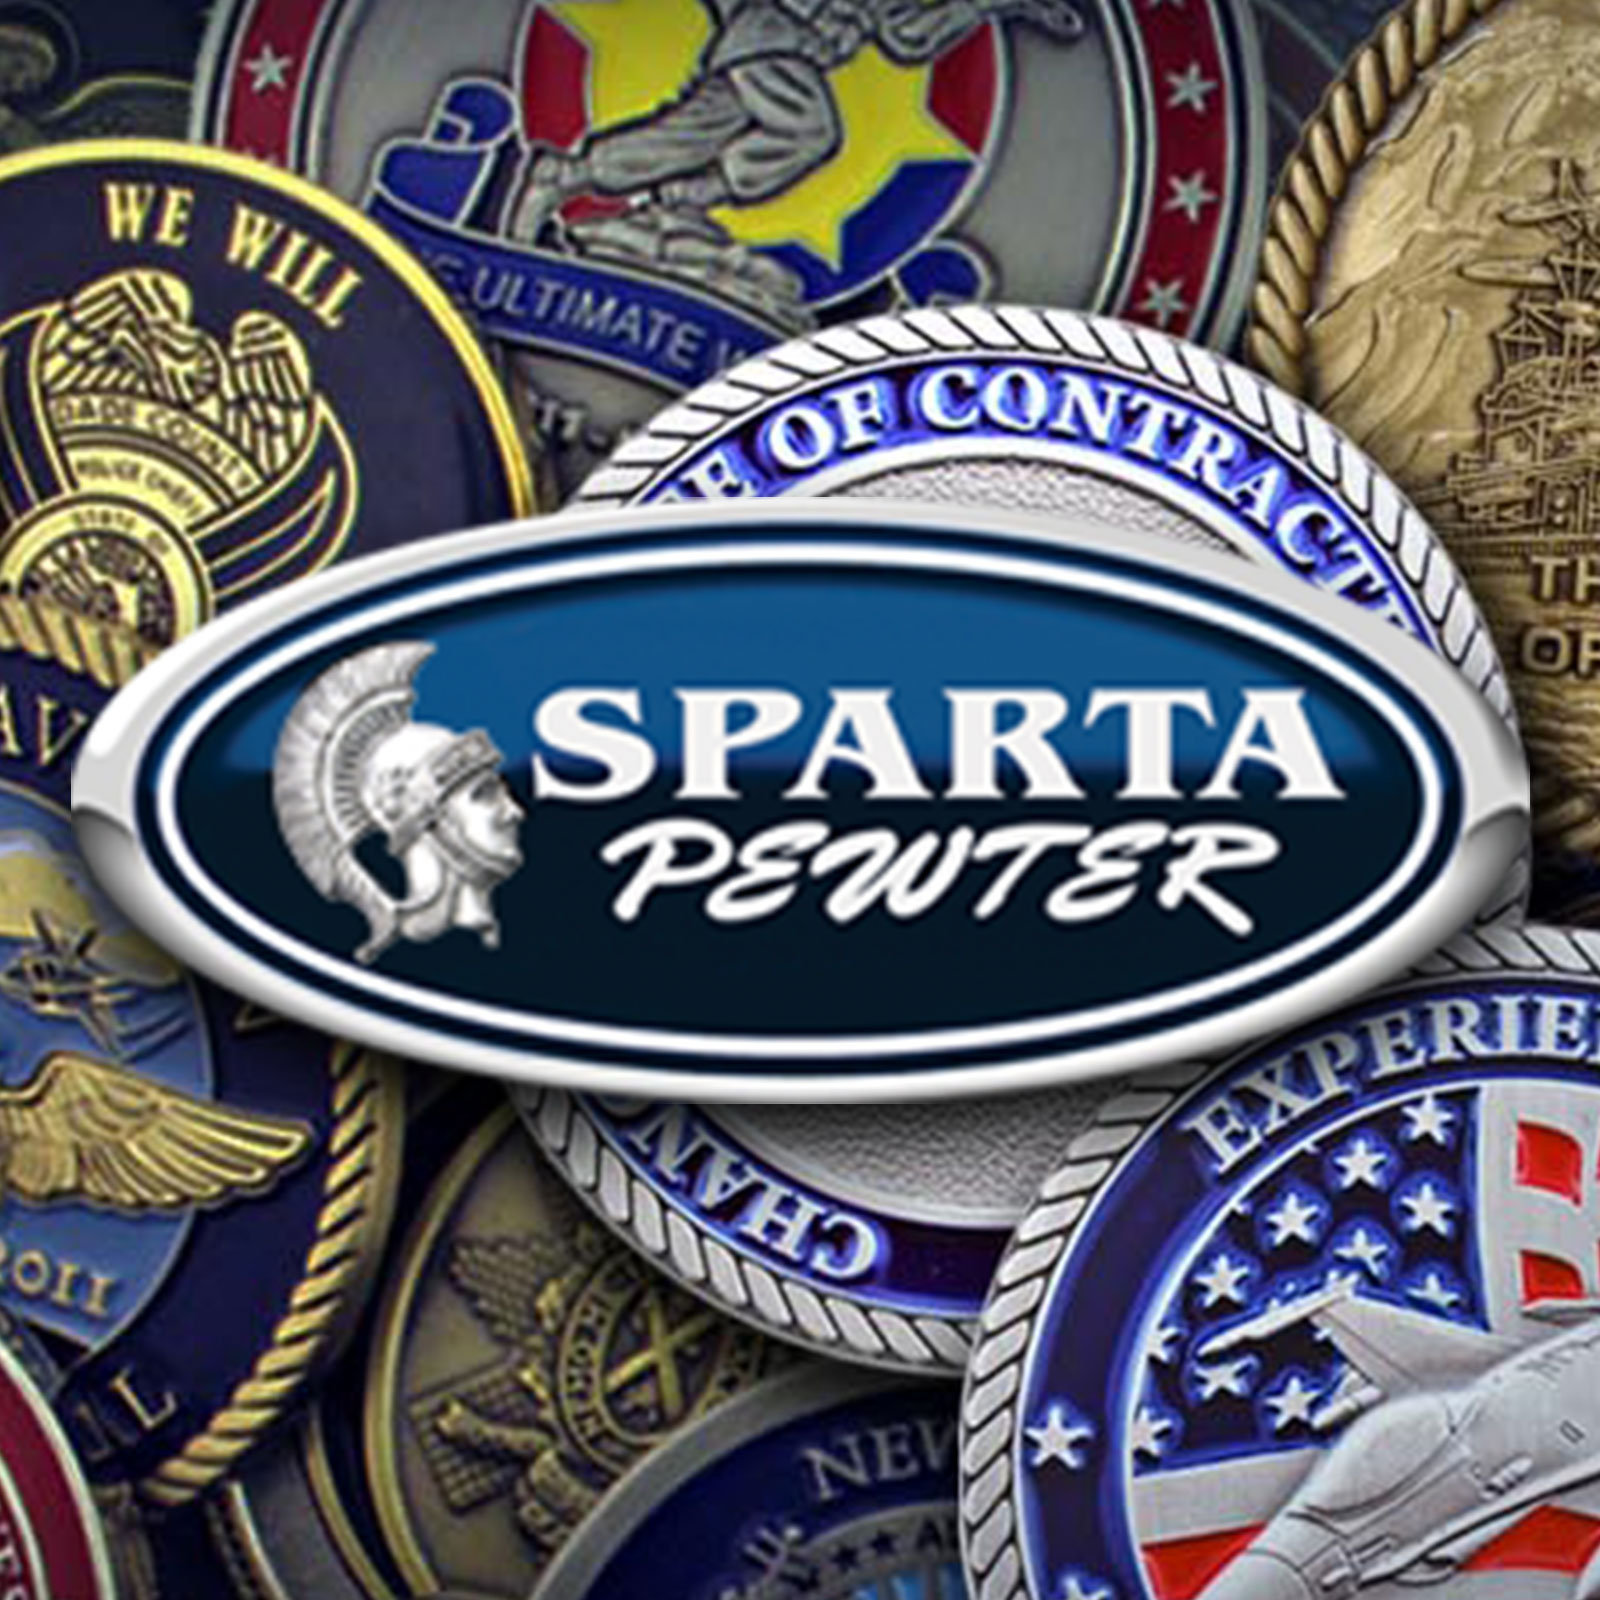 Sparta Pewter